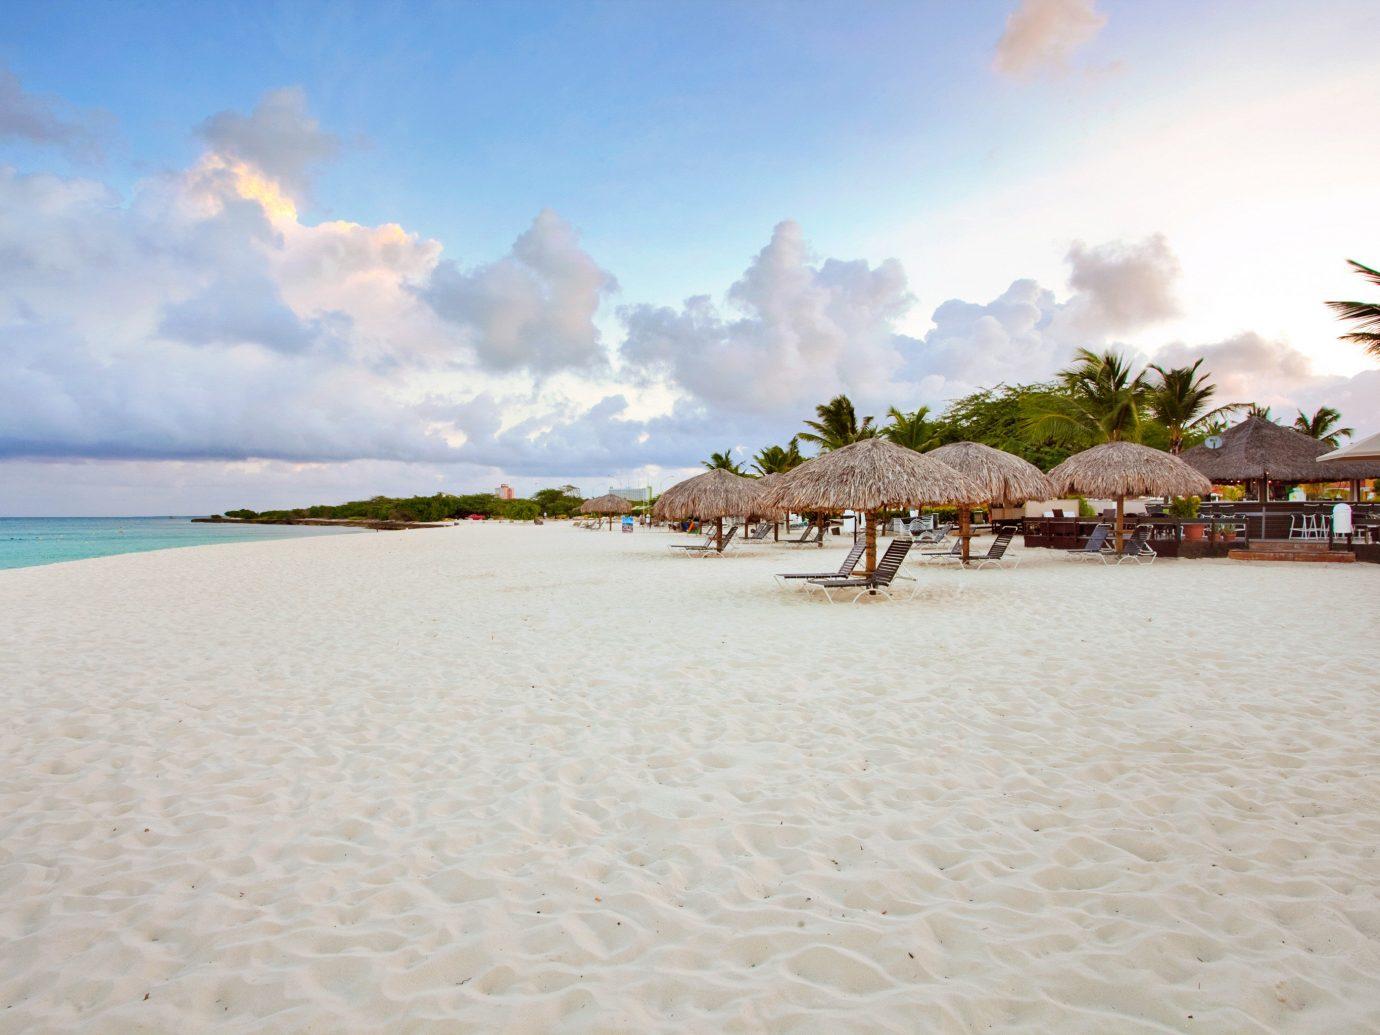 Beach Hotels Resort Romance outdoor sky water Nature shore body of water Sea vacation Ocean sand Coast caribbean bay sandy day